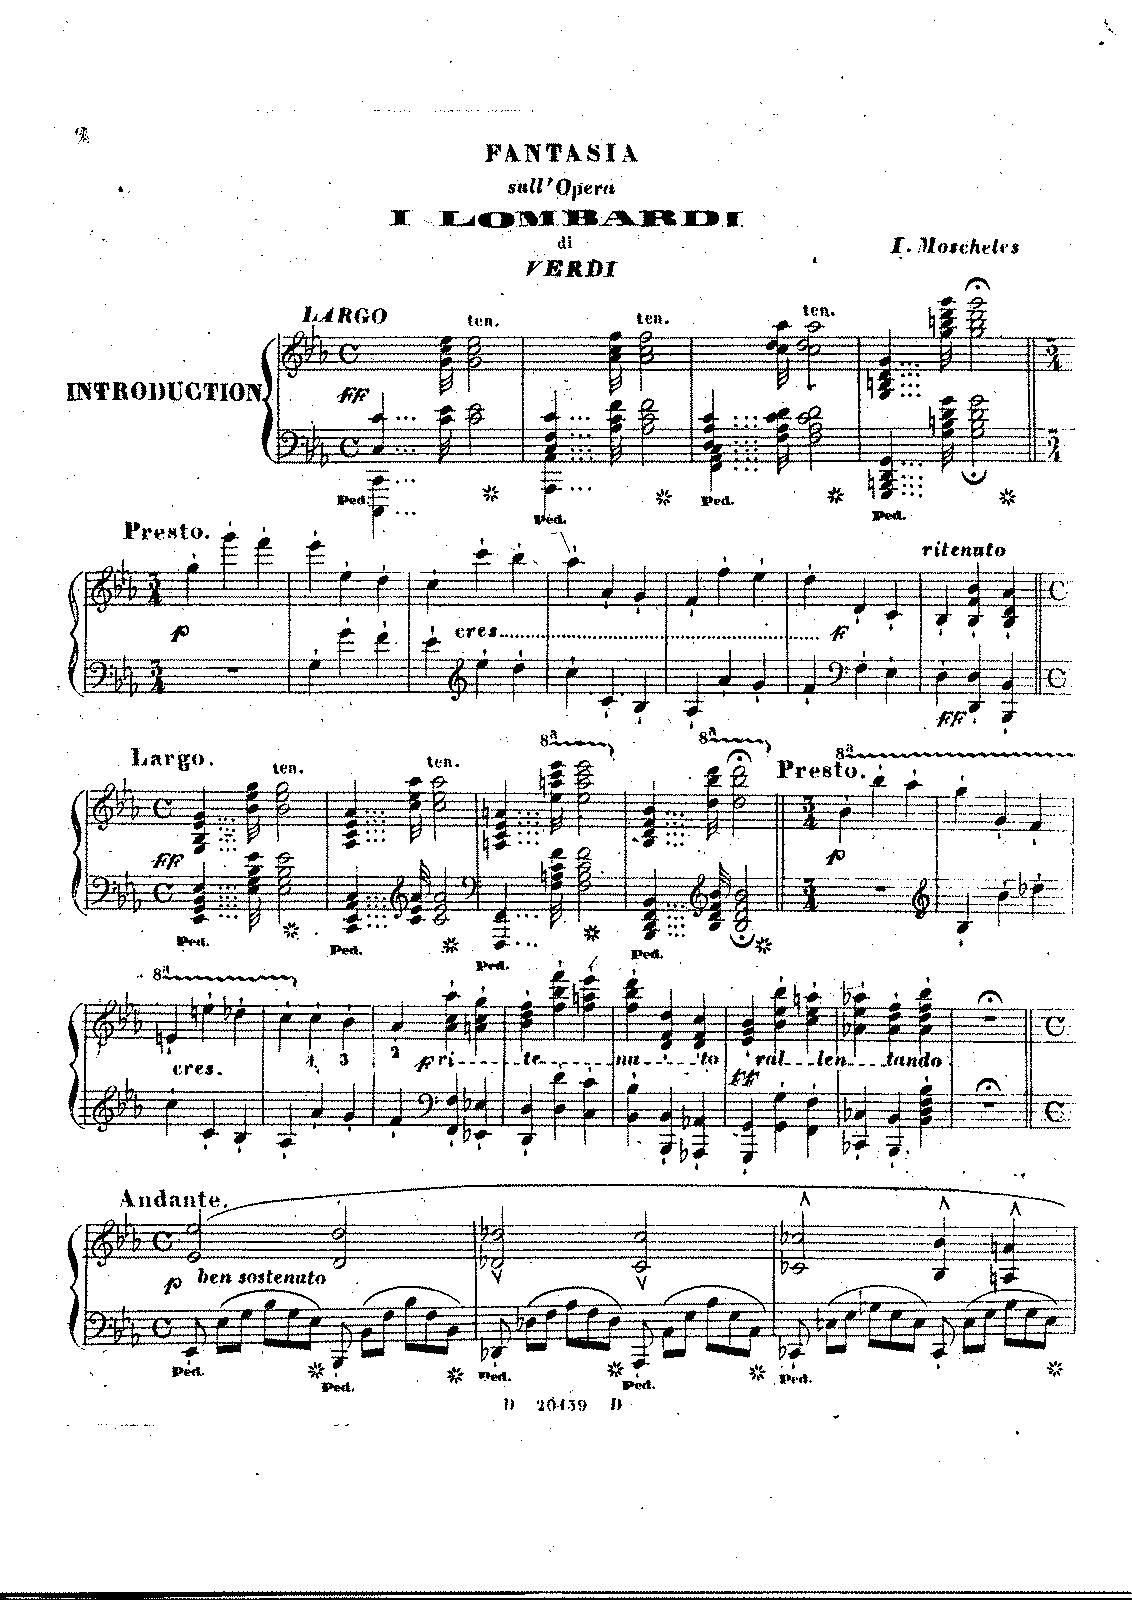 Fantasia sur 'I Lombardi' (Moscheles, Ignaz) - IMSLP/Petrucci Music